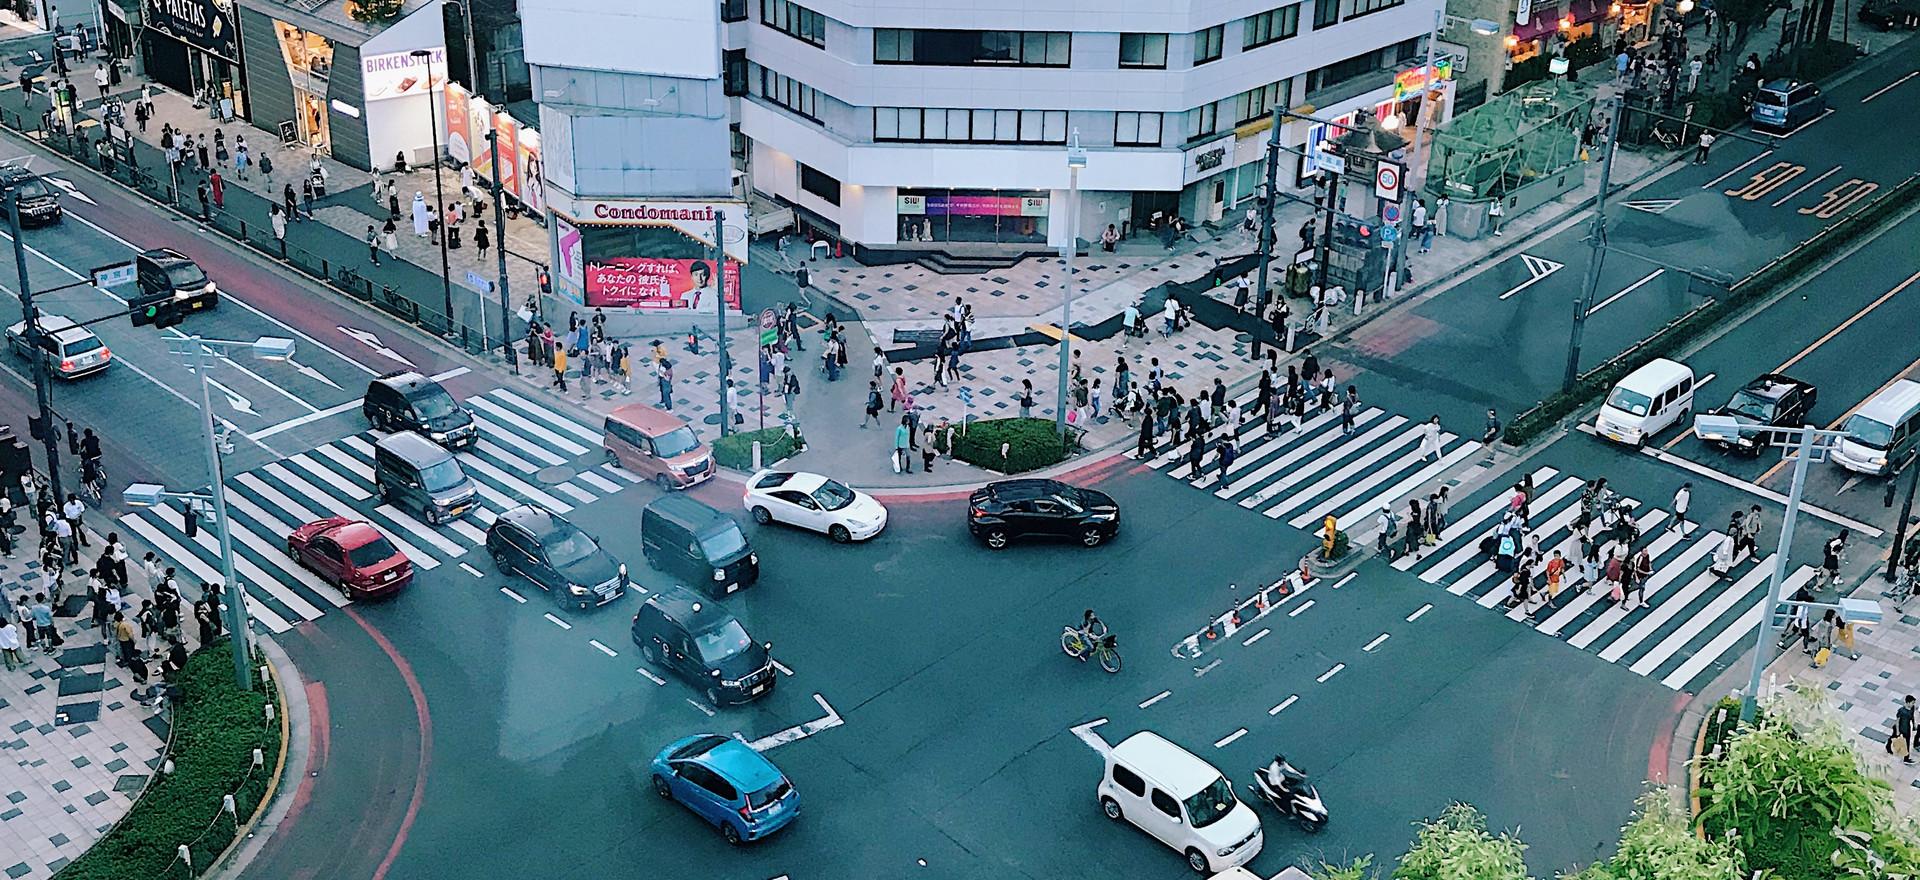 Harajuku Fashion City